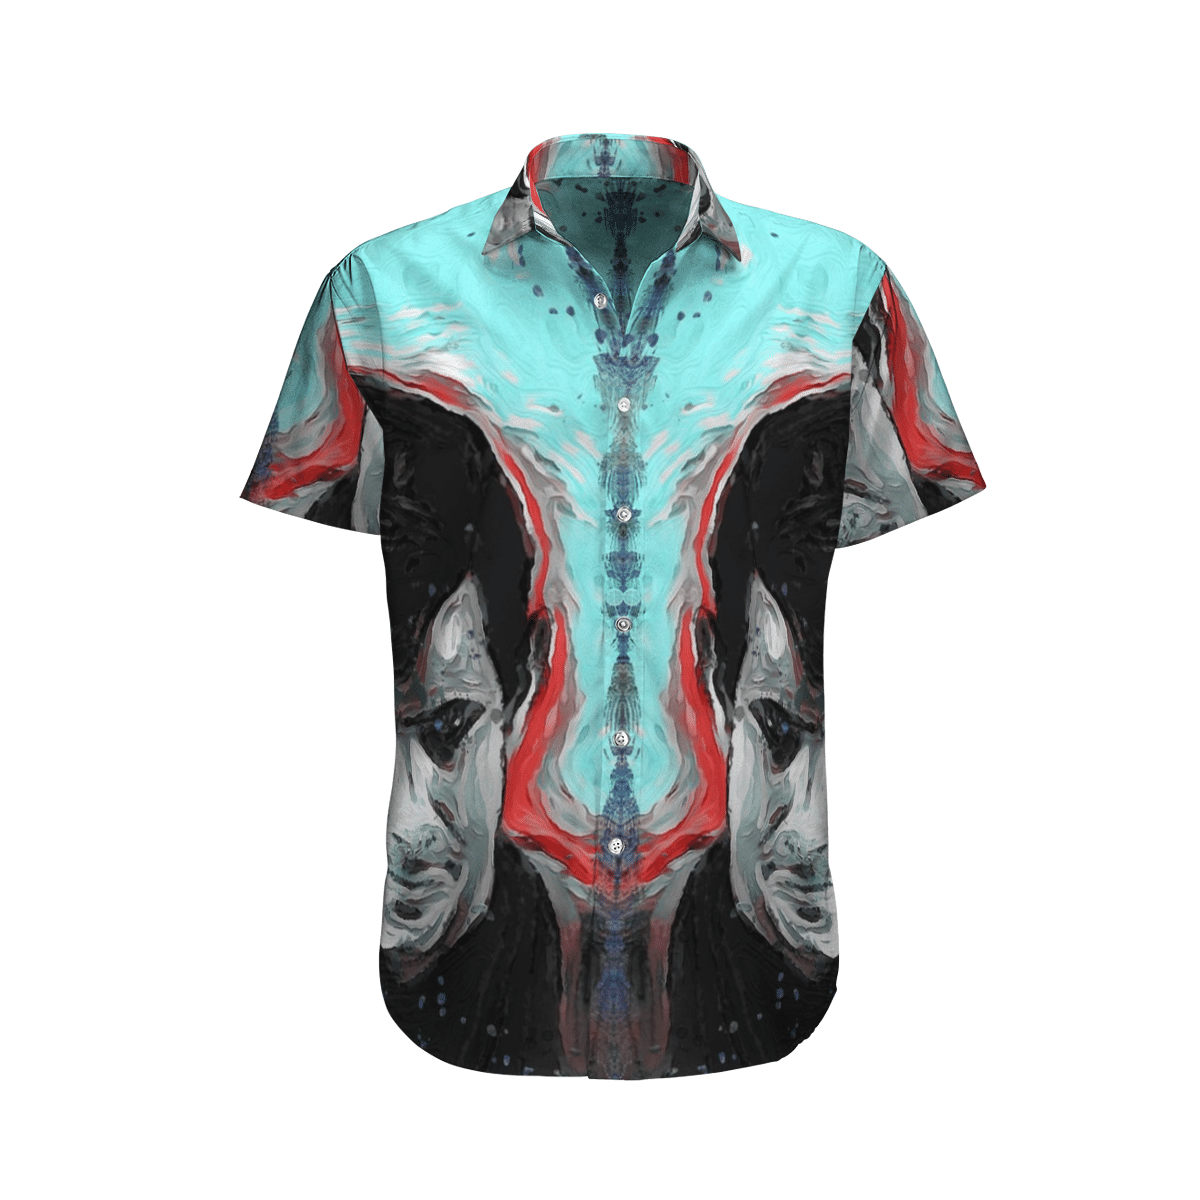 Psycho Norman Smile Hawaiian Shirt